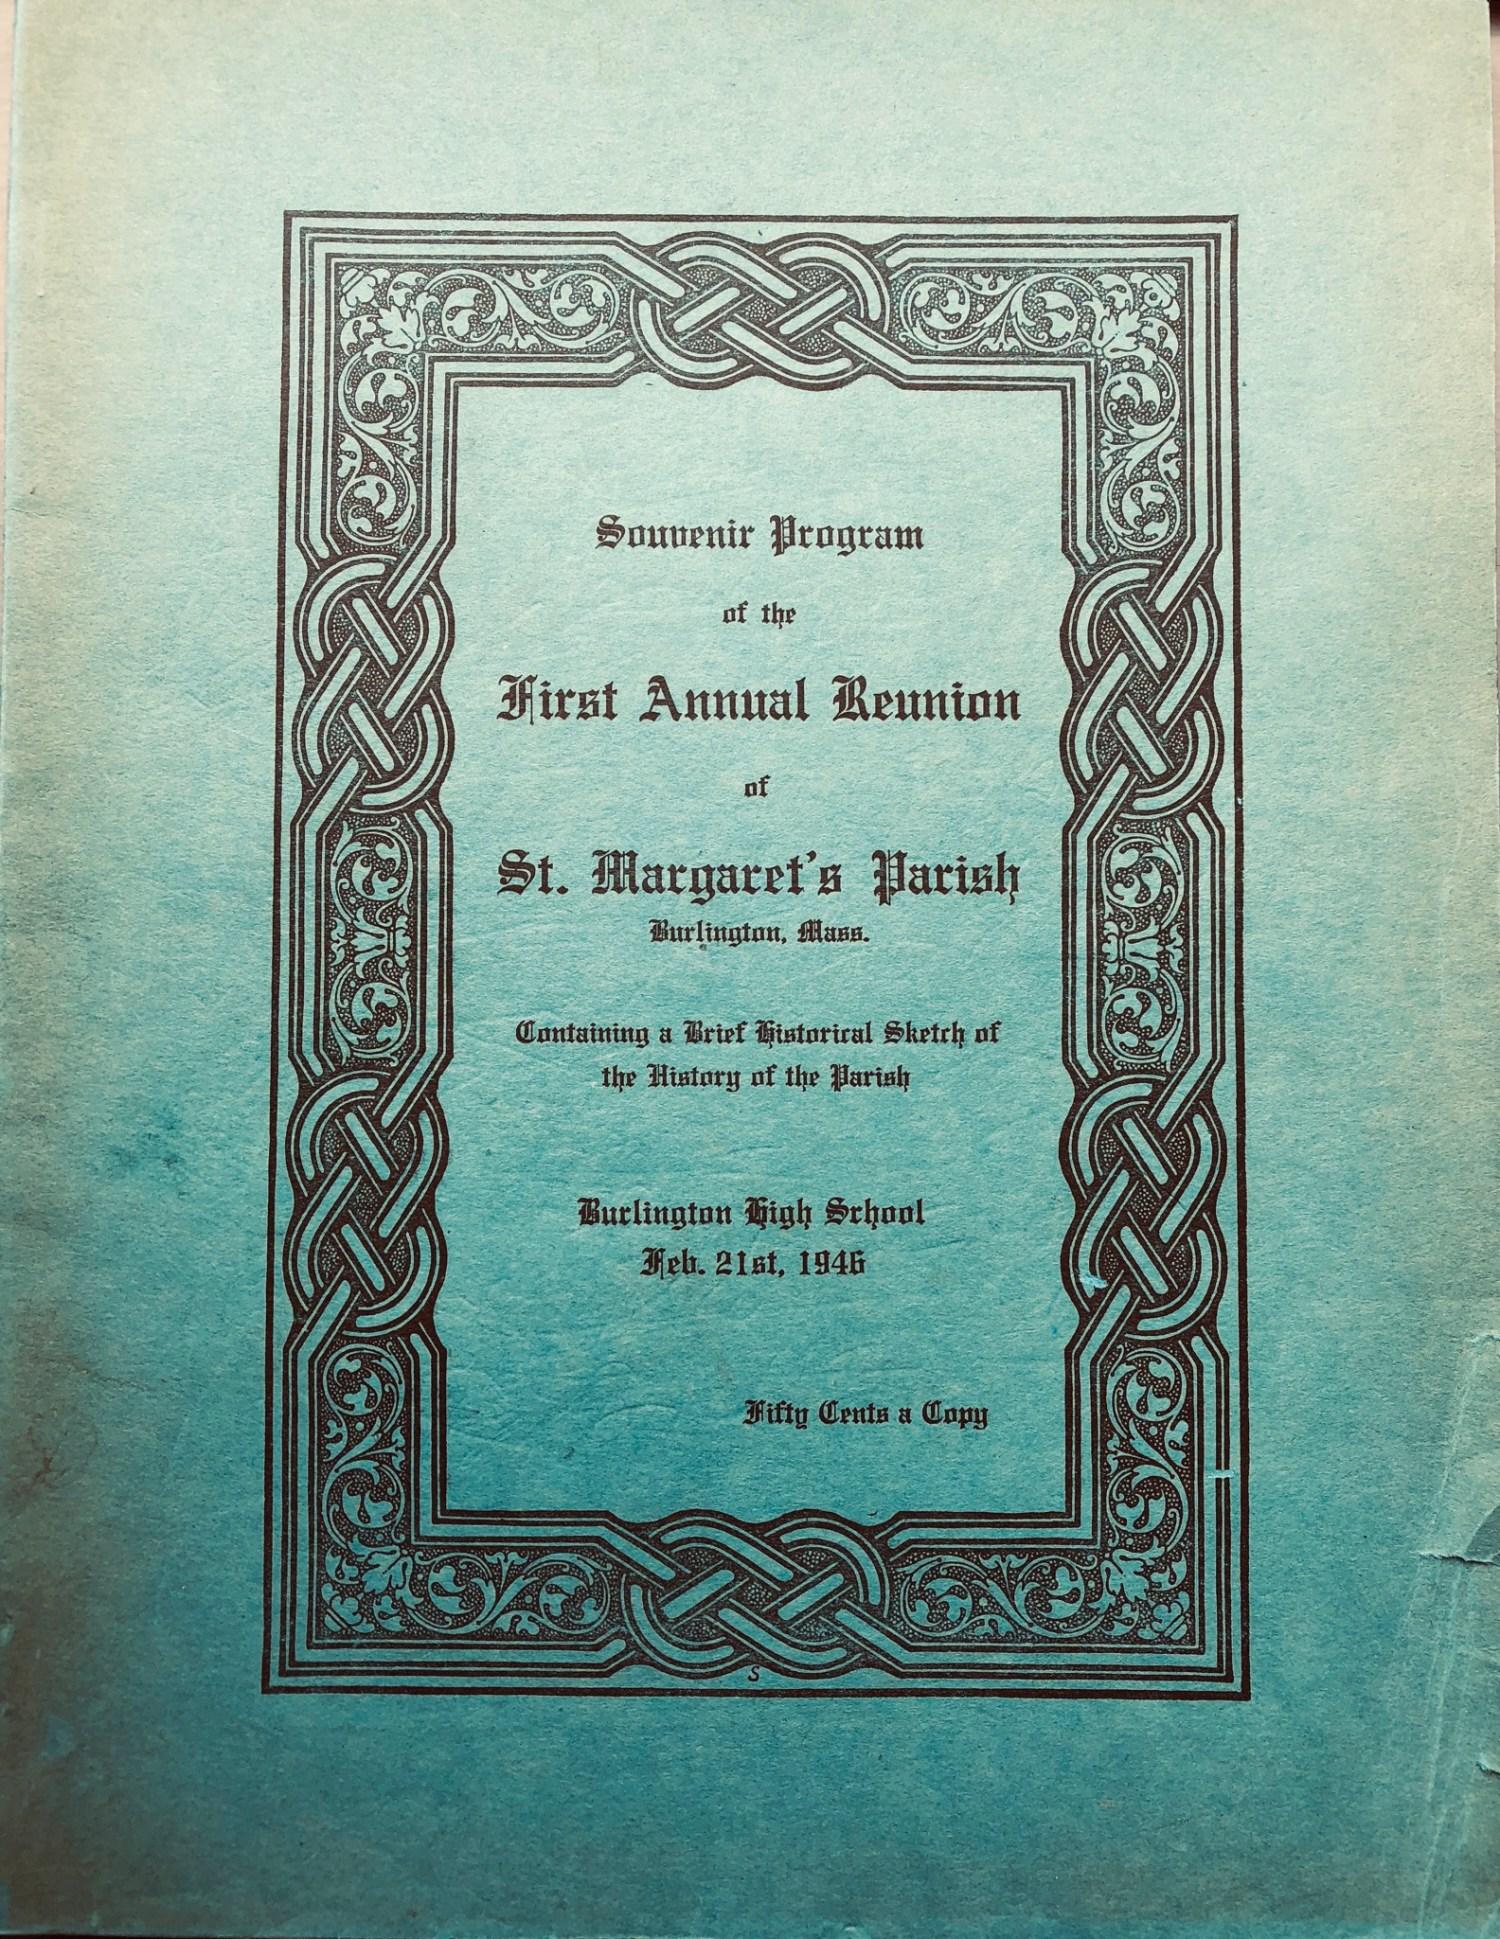 St. Margaret's Reunion book cover, Burlington MA